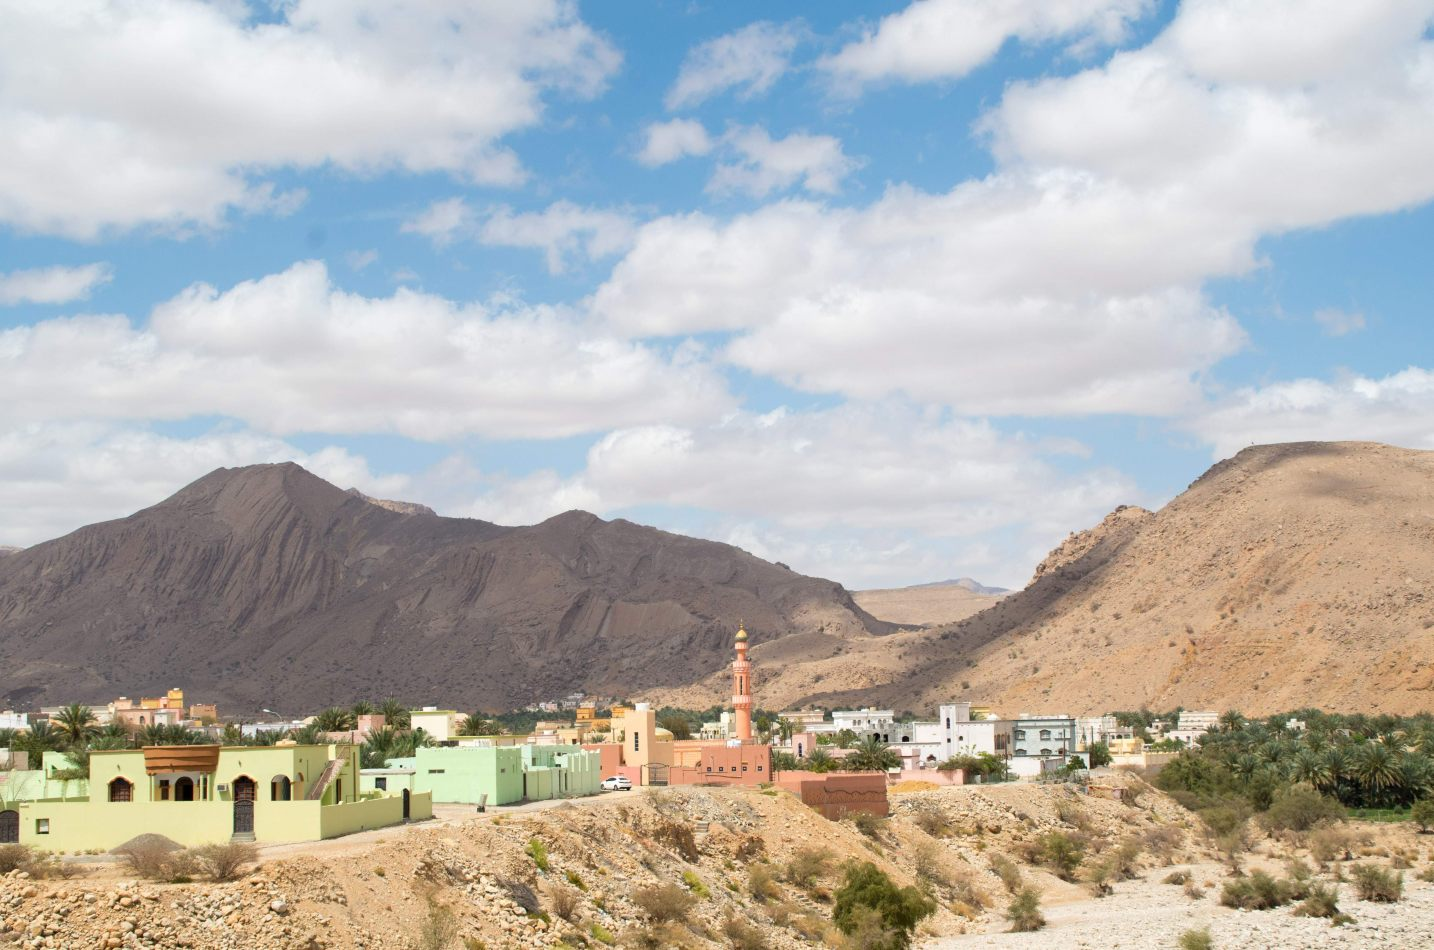 Hibiscus & Nomada : Oman - Village in Djebel Shams